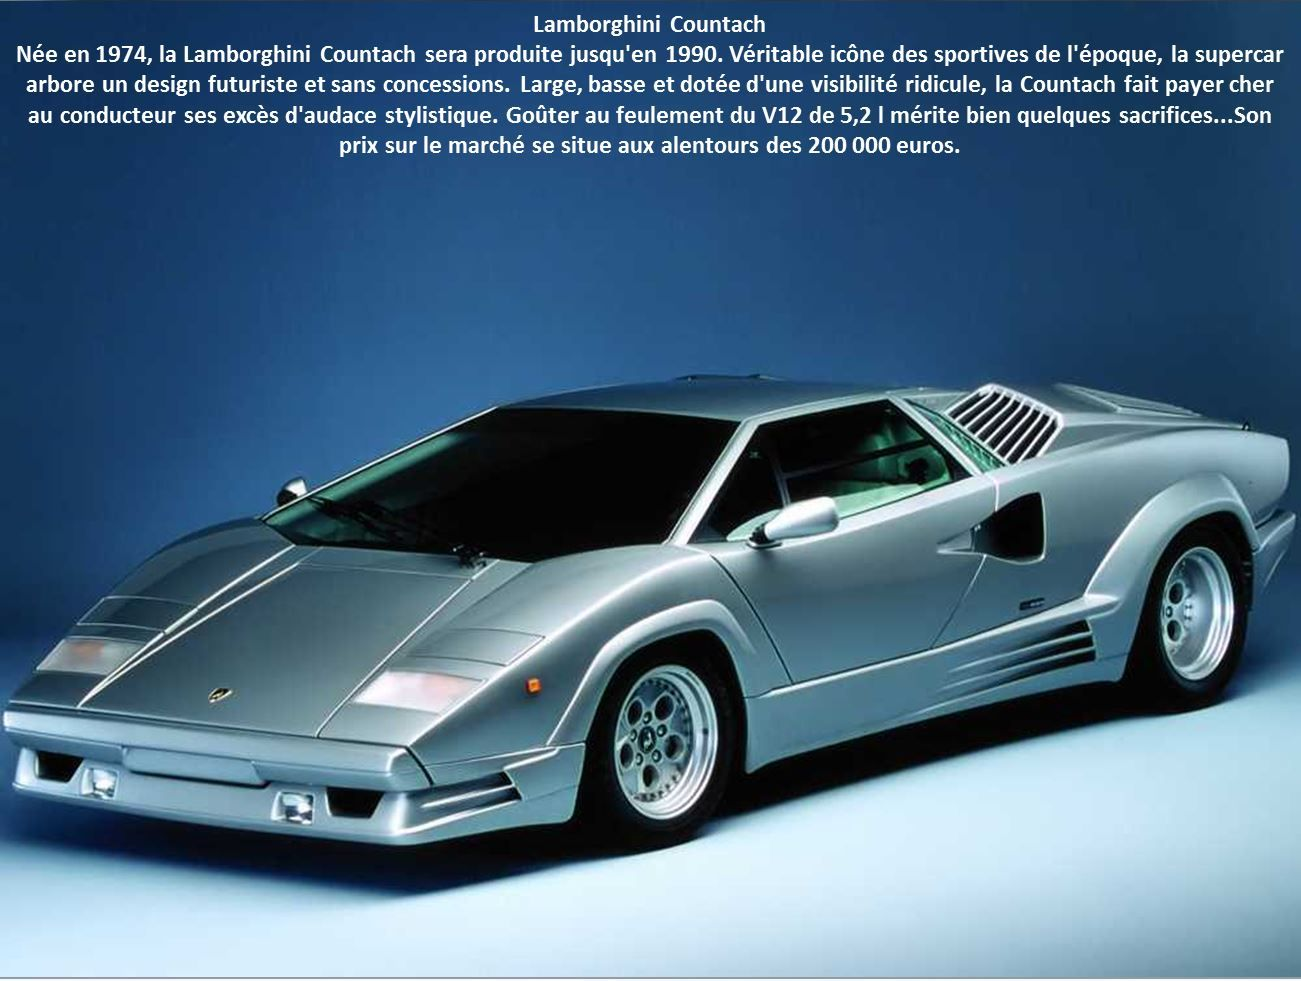 Pin By Henri Poulin On Voiture Pinterest Automotive - Sports cars 5 letters